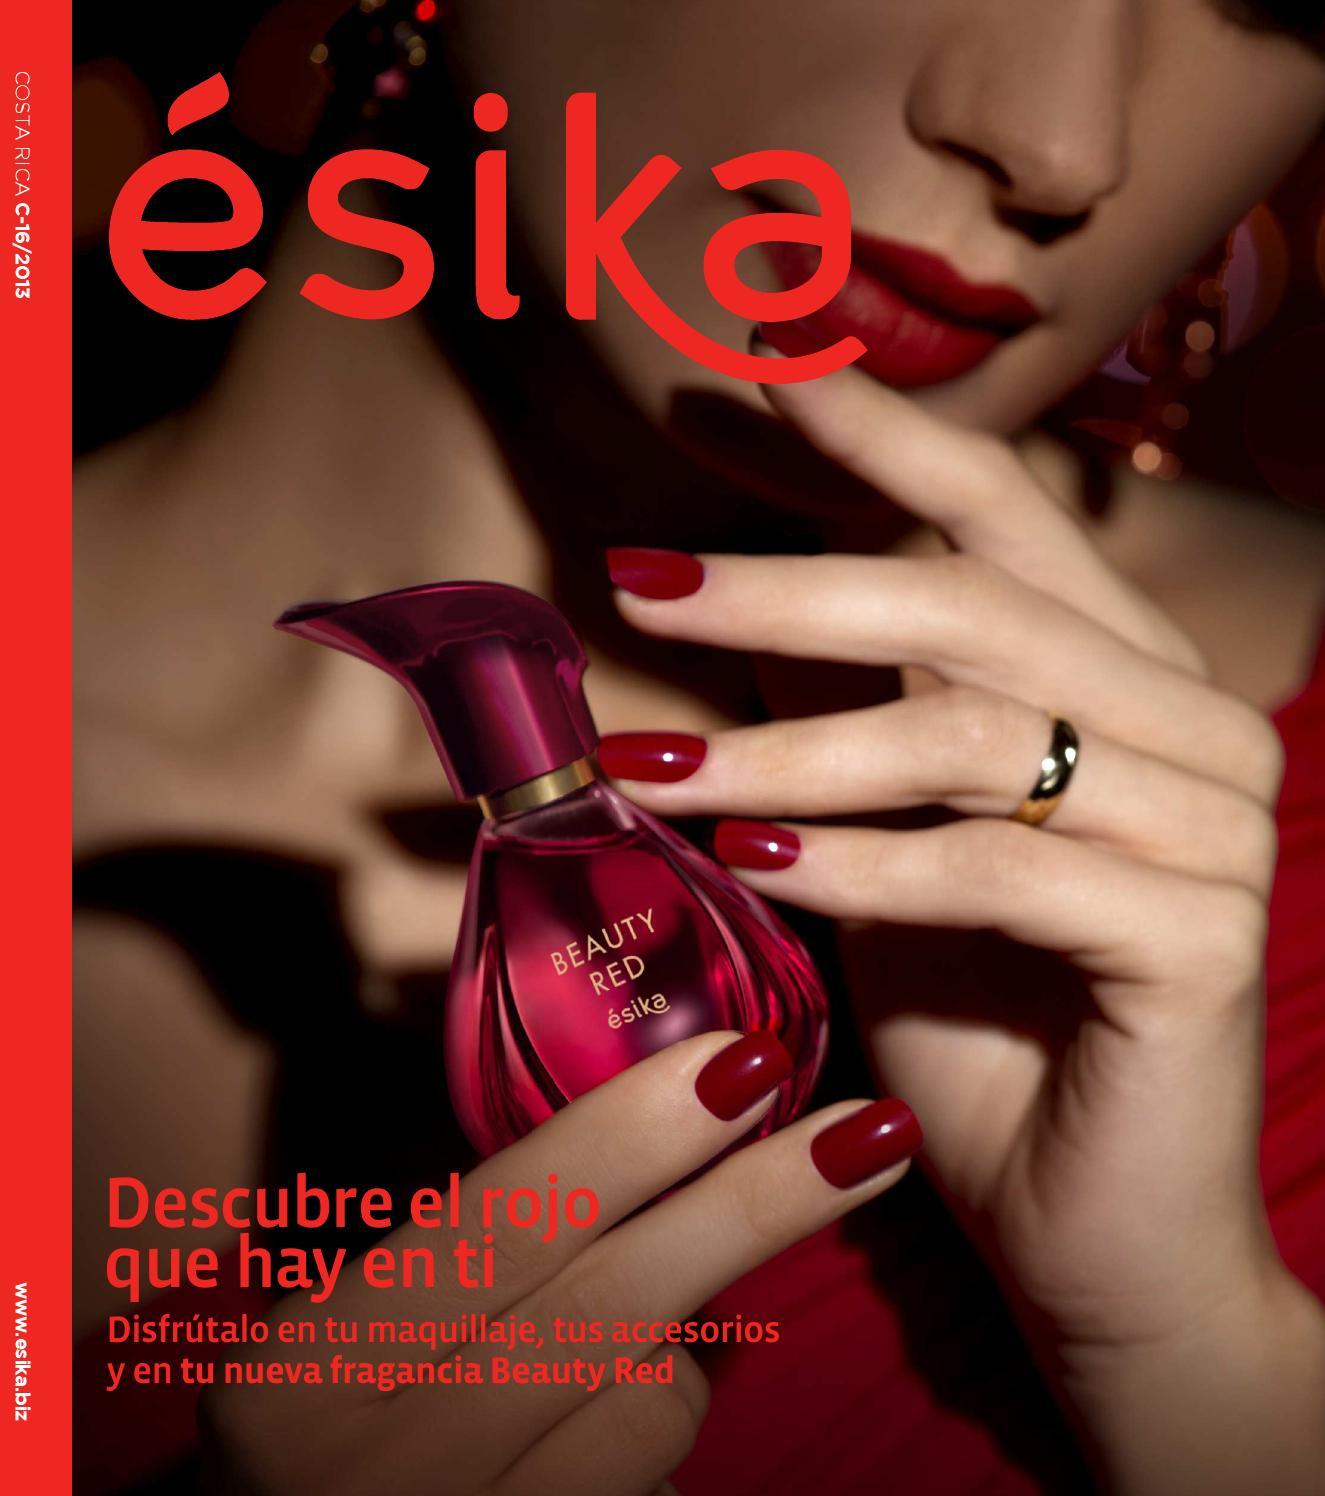 Catálogo Ésika Costa Rica C16 by SomosBelcorp - issuu